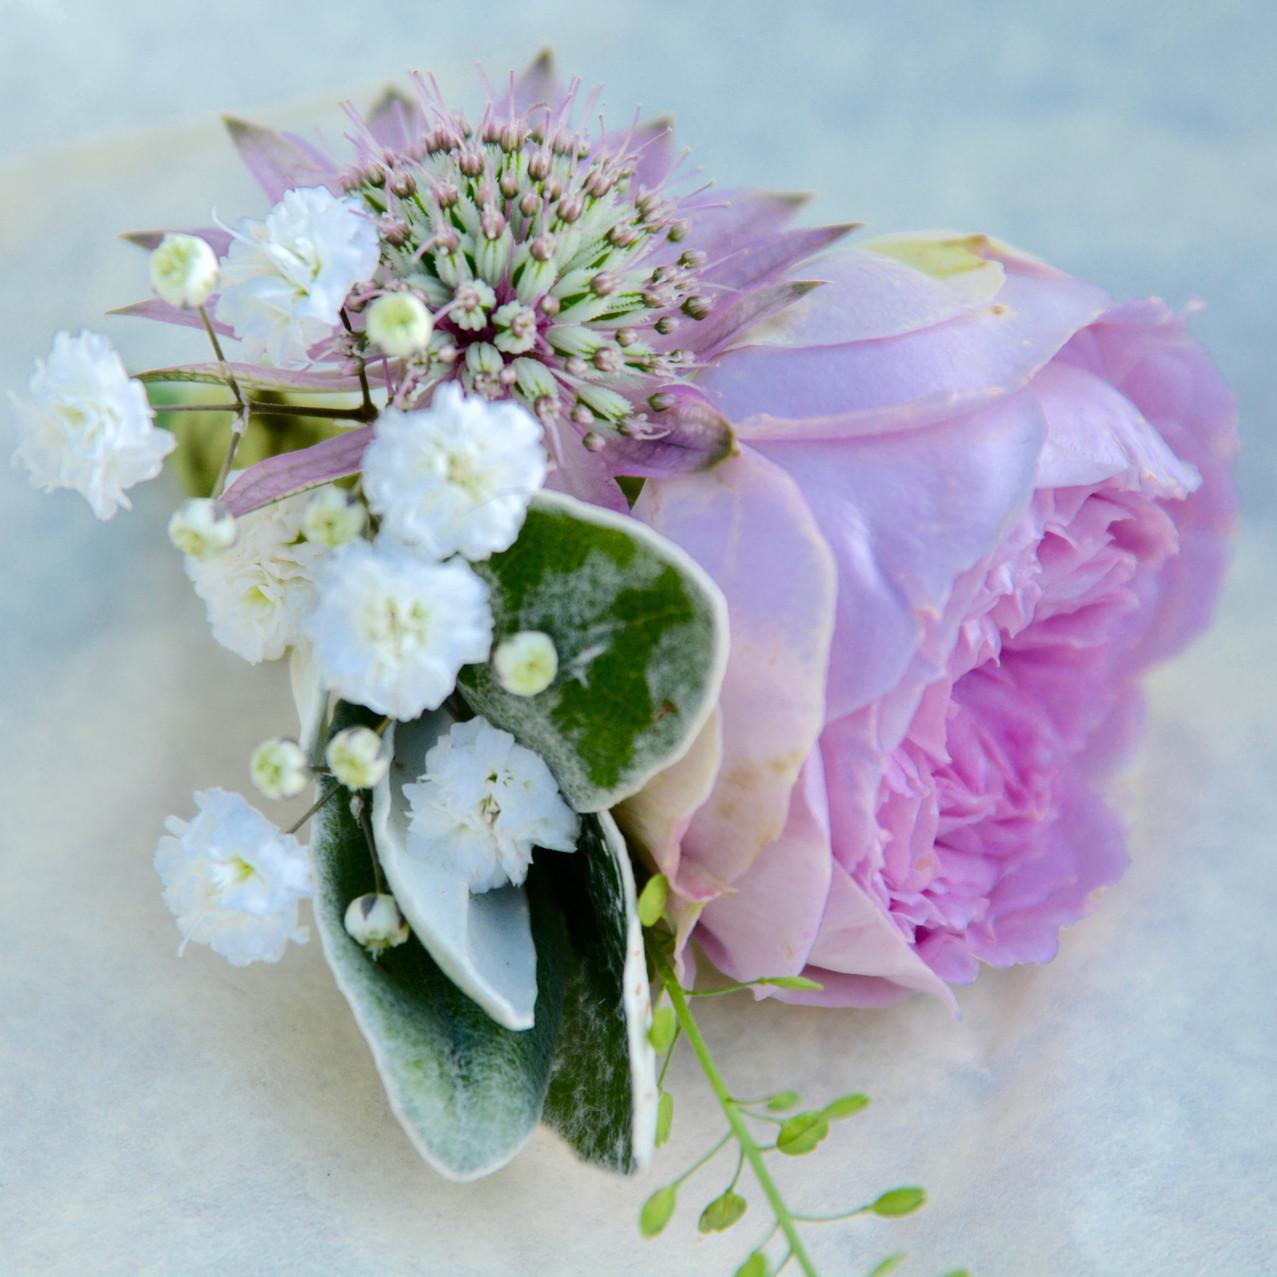 Spray rose buttonhole, dresssed with fluffy gypsophila, astrantia and thylaspi